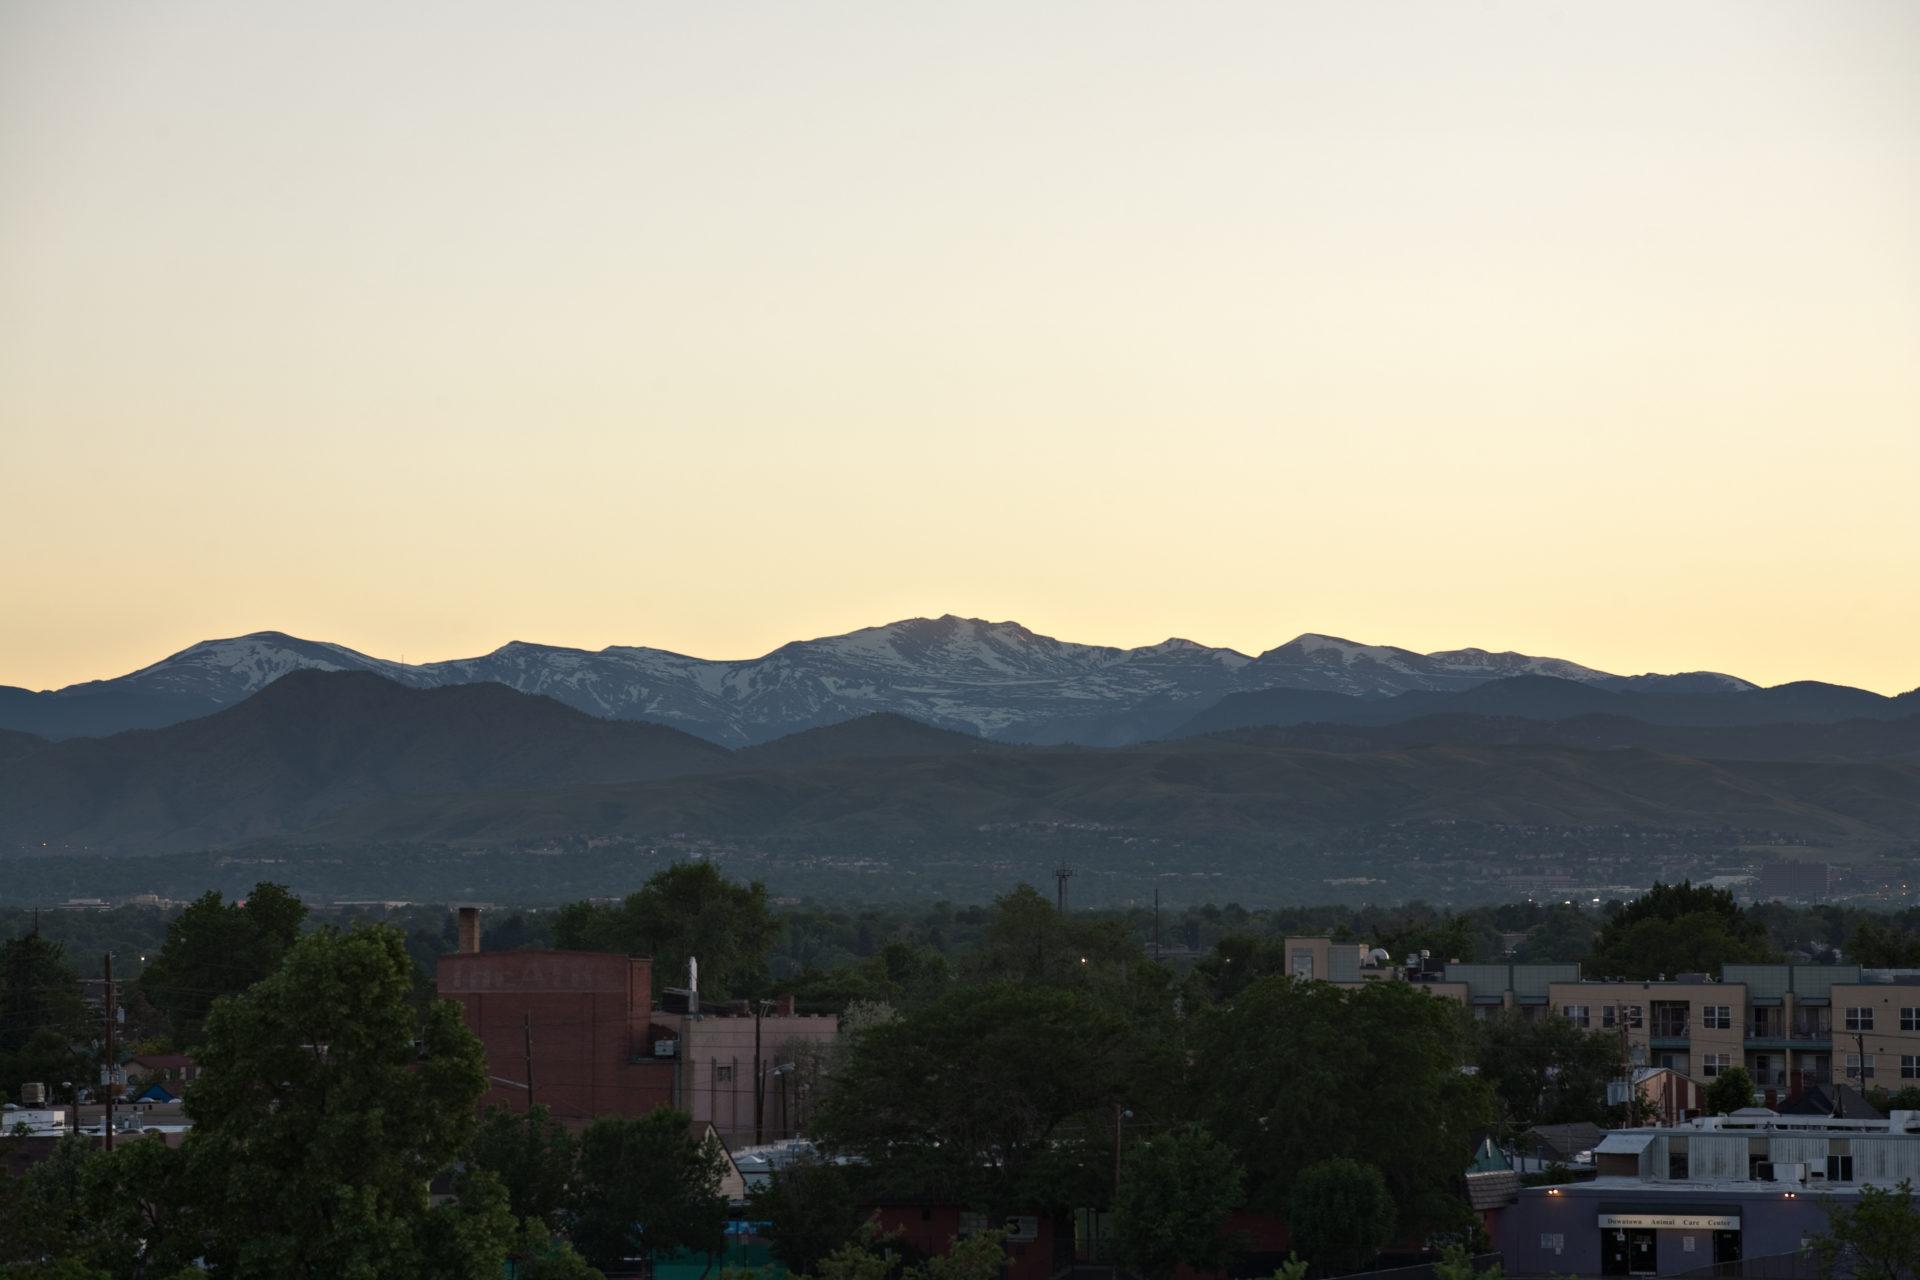 Mount Evans sunset - June 7, 2011